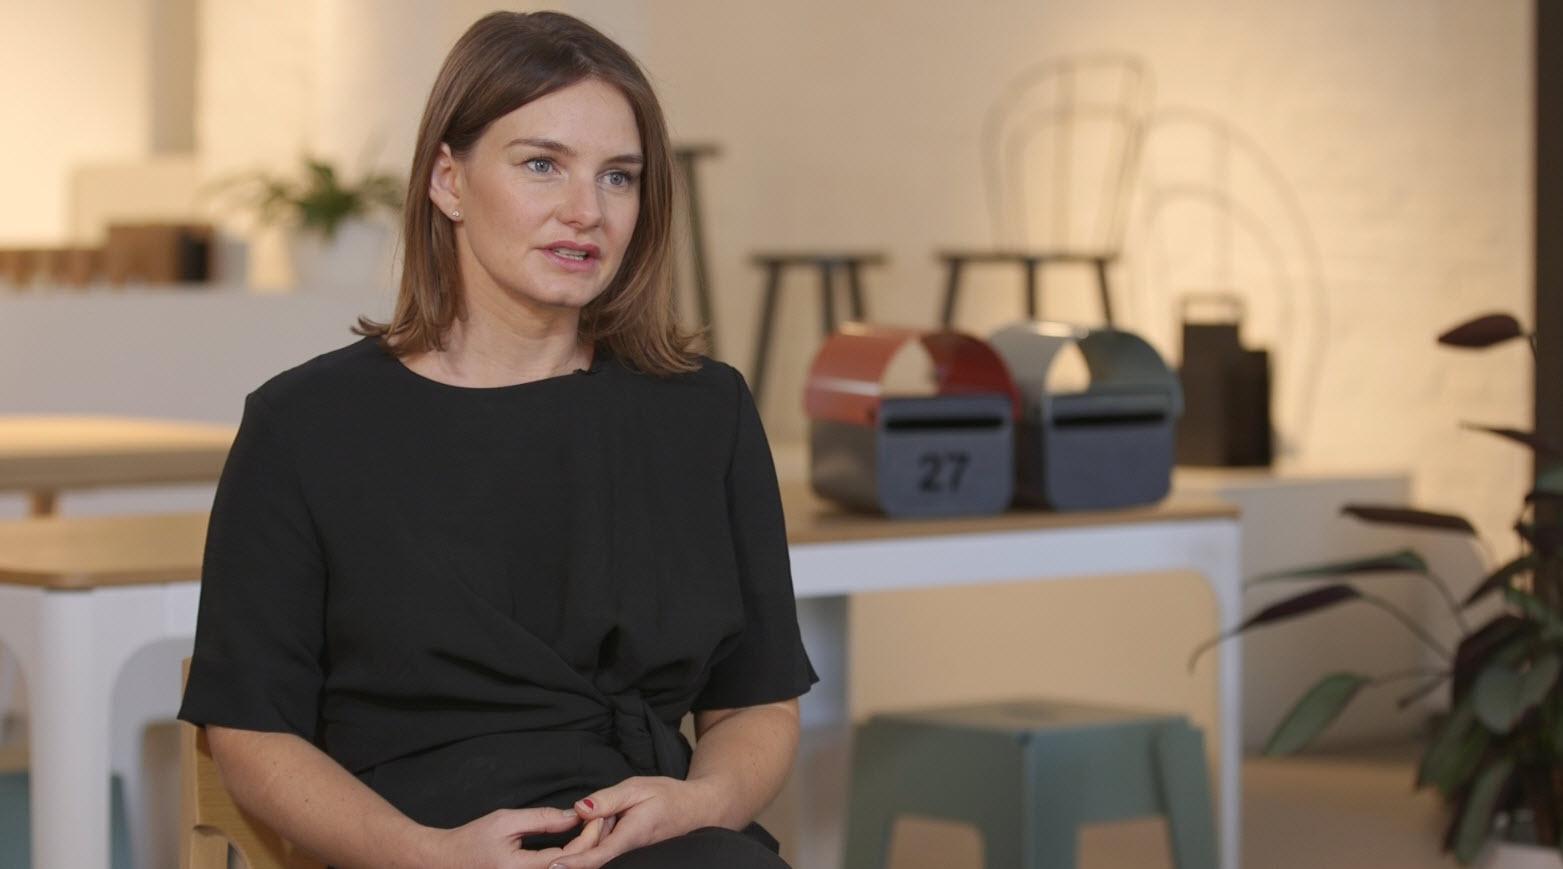 DesignByThem co-founder Sarah Gibson.